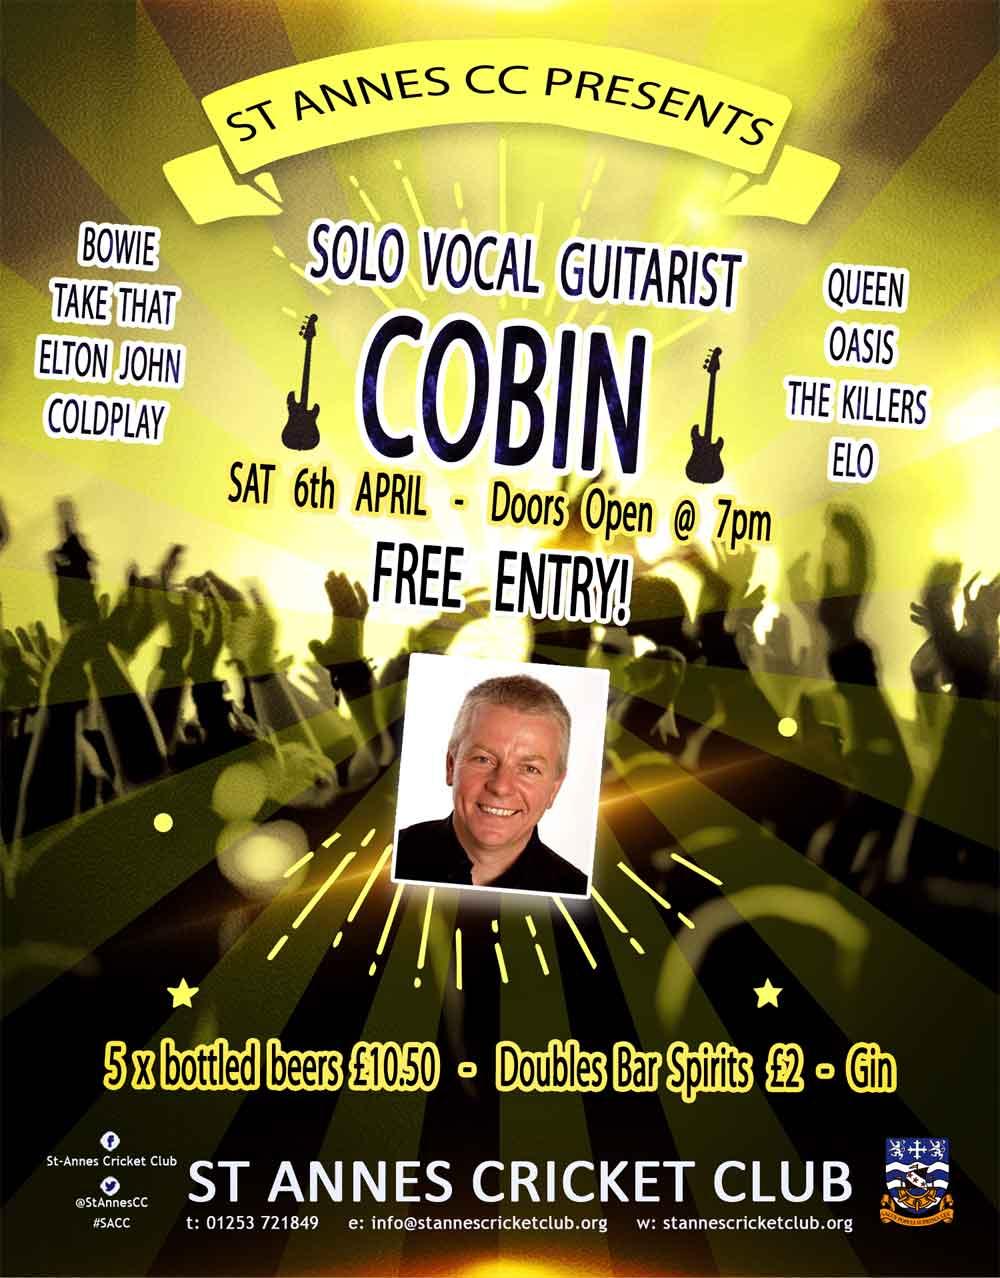 Superb solo vocal guitarist Cobin